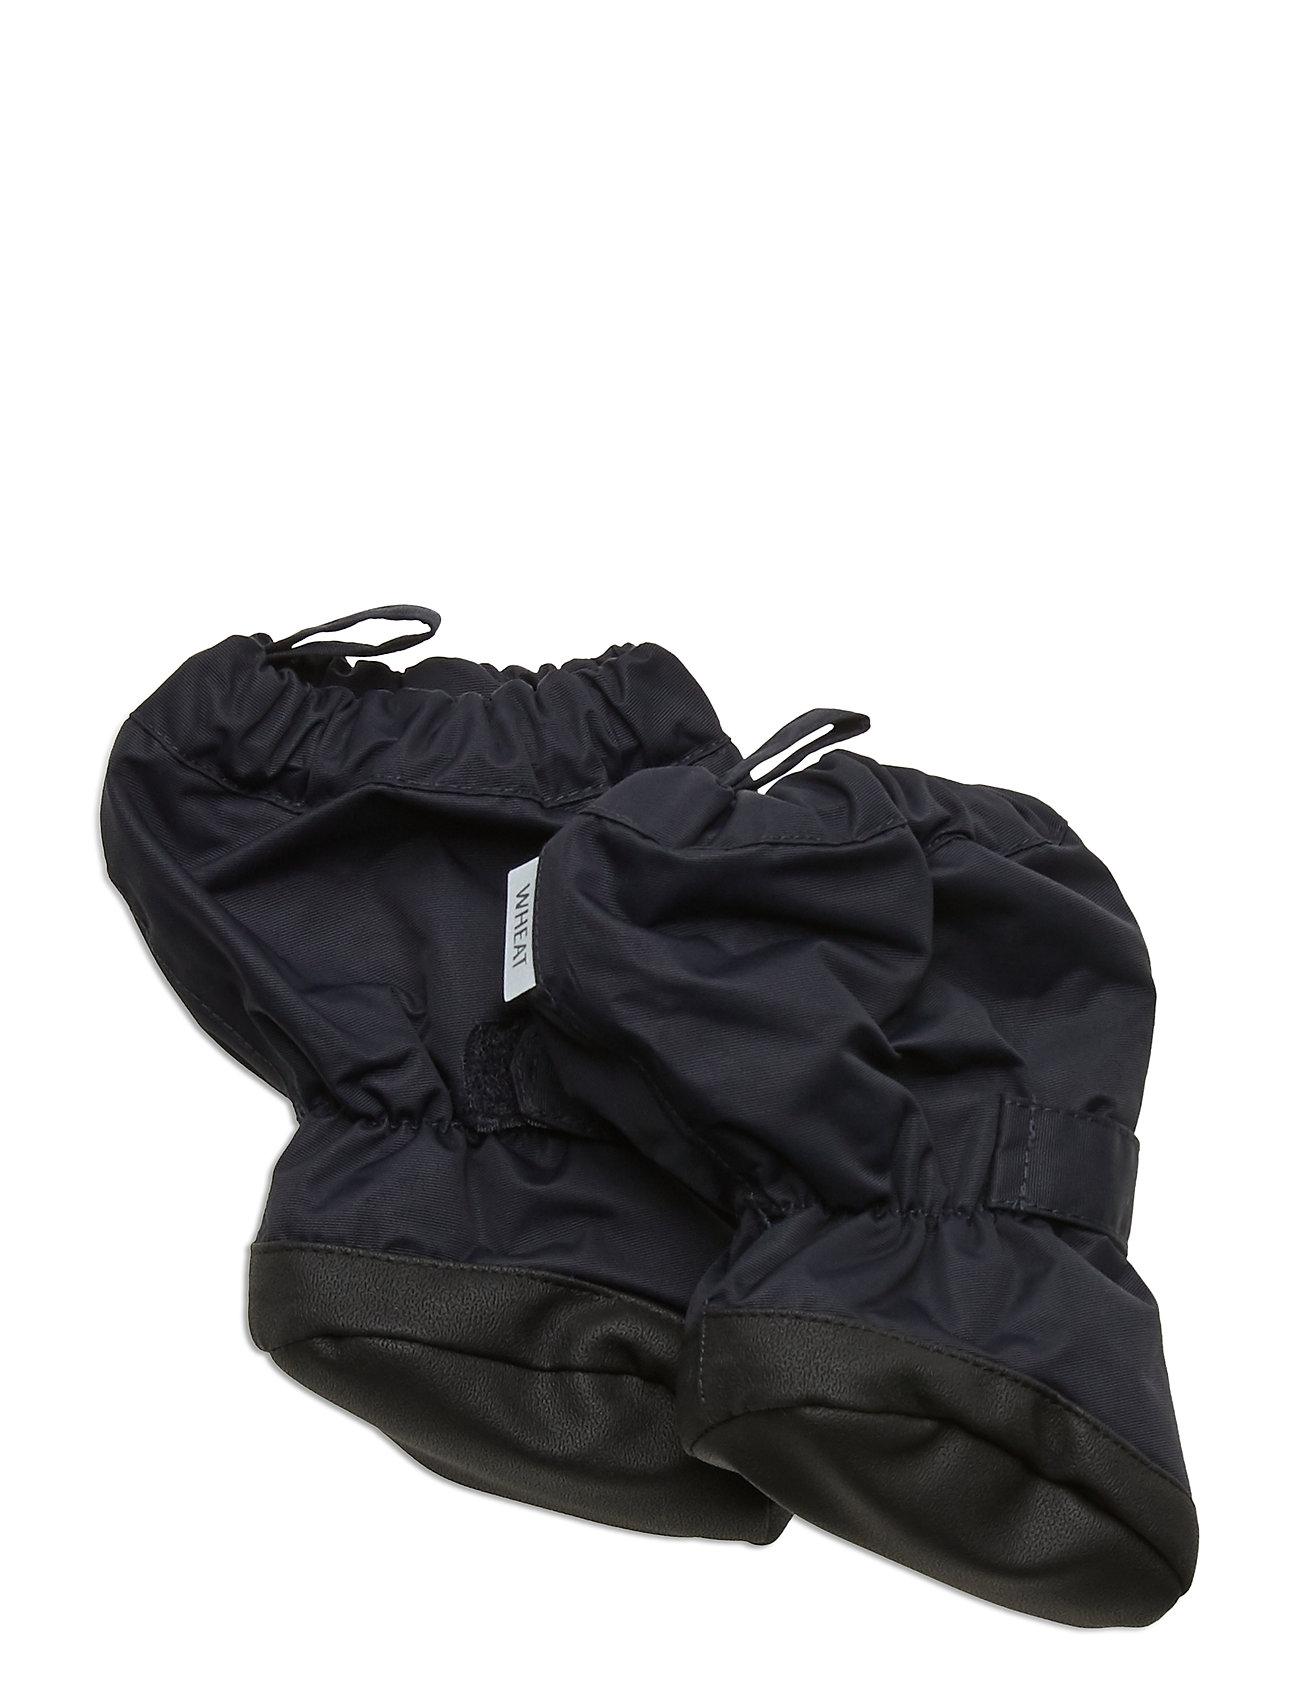 Image of Outerwear Booties Tech Outerwear Rainwear Accessories Blå Wheat (3446397659)